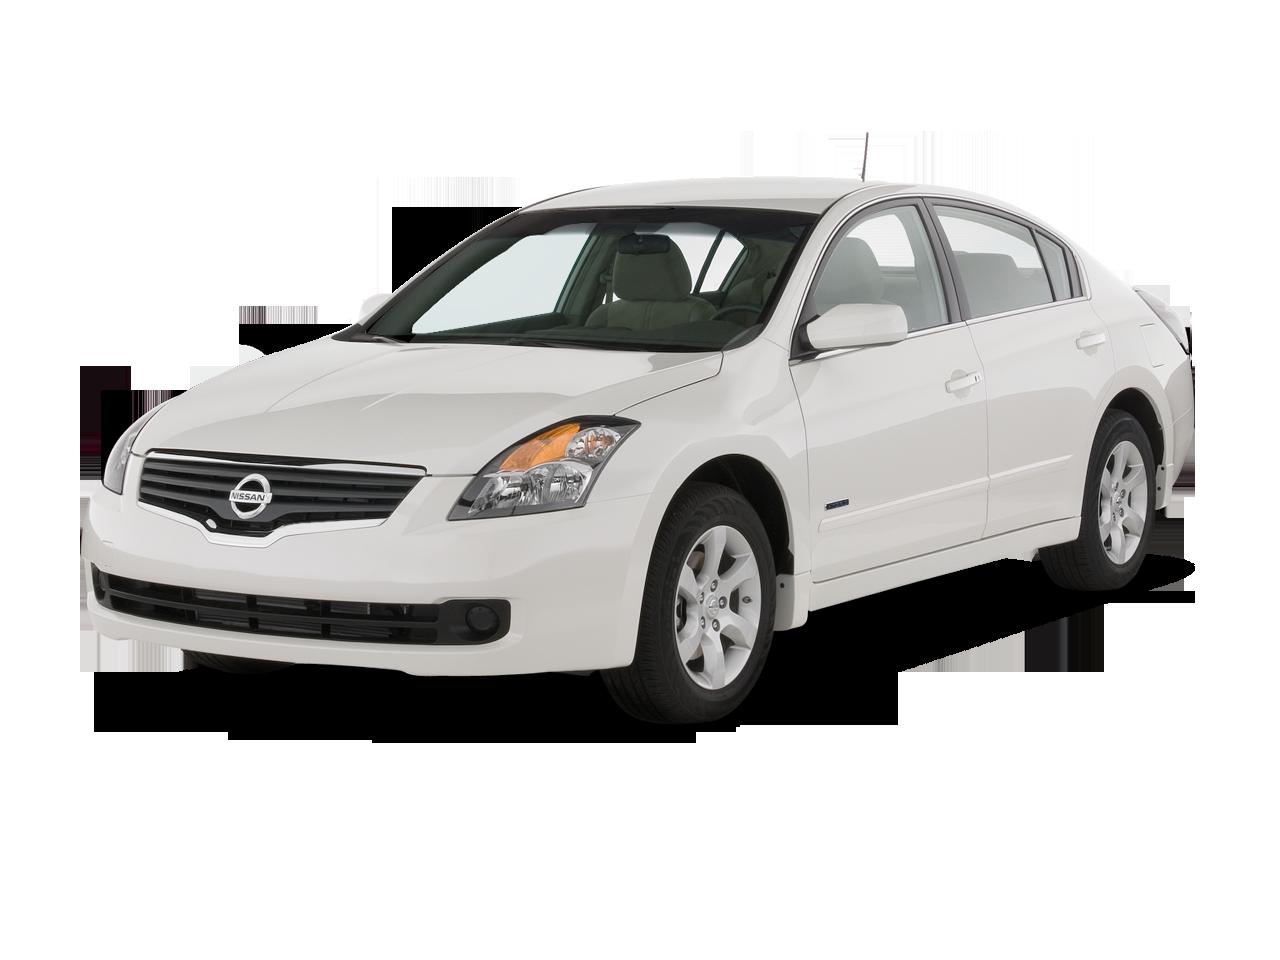 53 Best Review 2007 Nissan Altima Hybrid Specs by 2007 Nissan Altima Hybrid